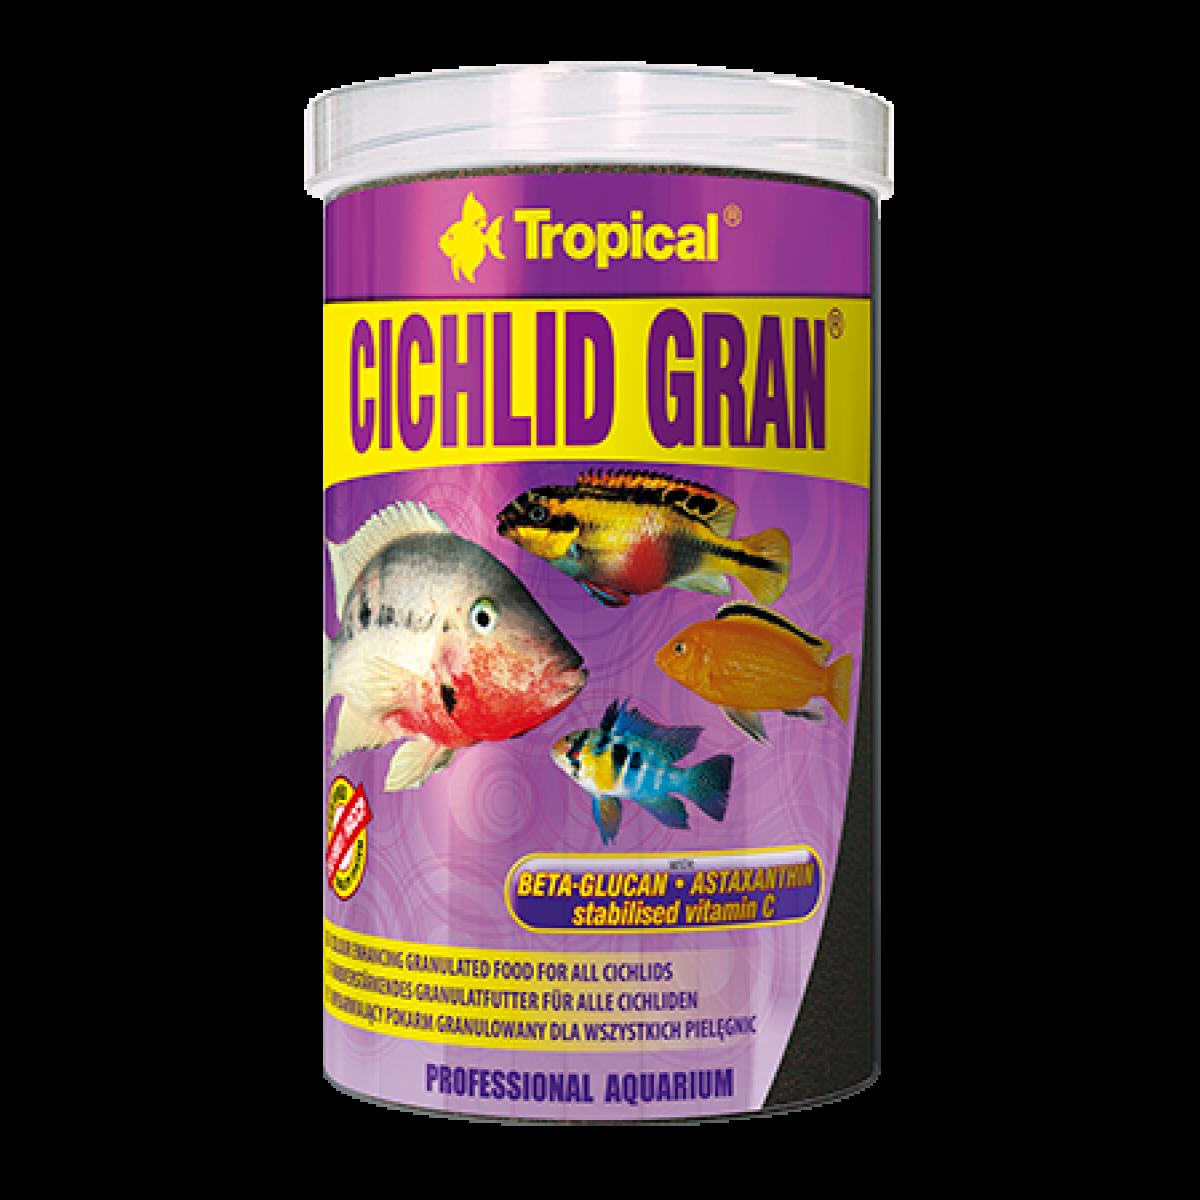 Tropical Cichlid Gran 250 мл - корм для цихлид с астаксантином  (60454)